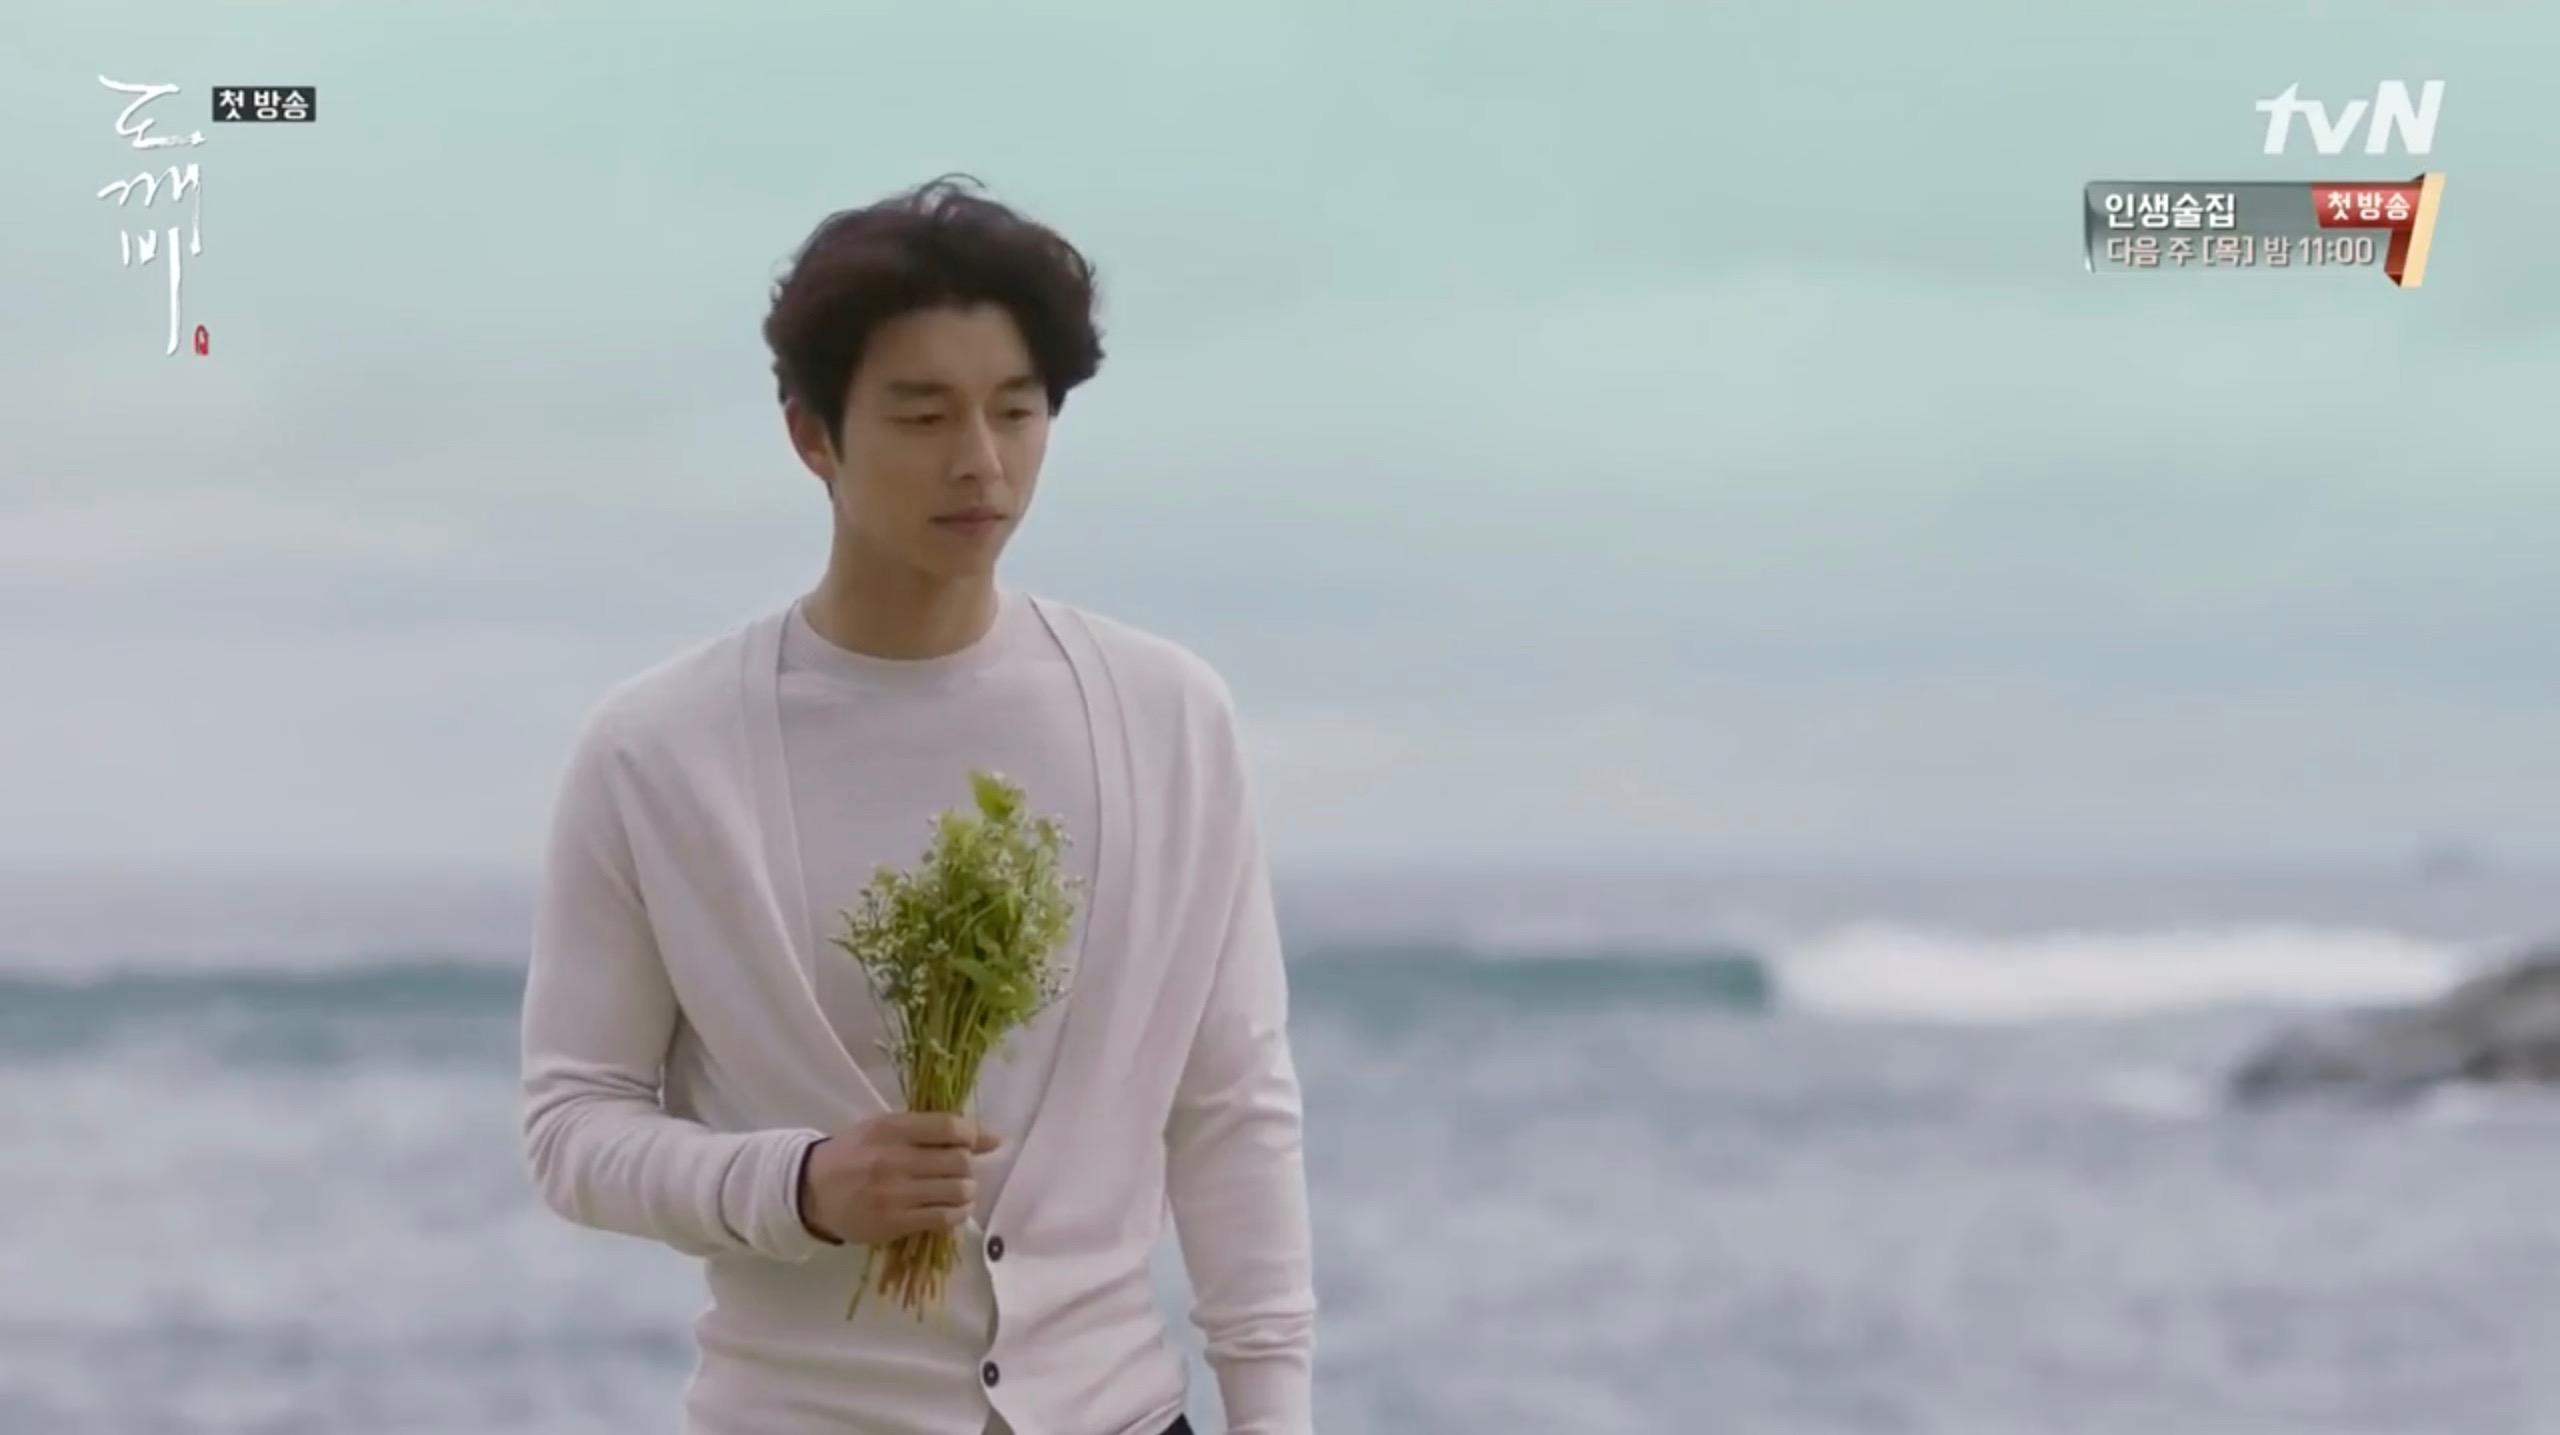 kim-shin-gong-yoo-with-buckwheat-flower-meaning-korean-drama-goblin